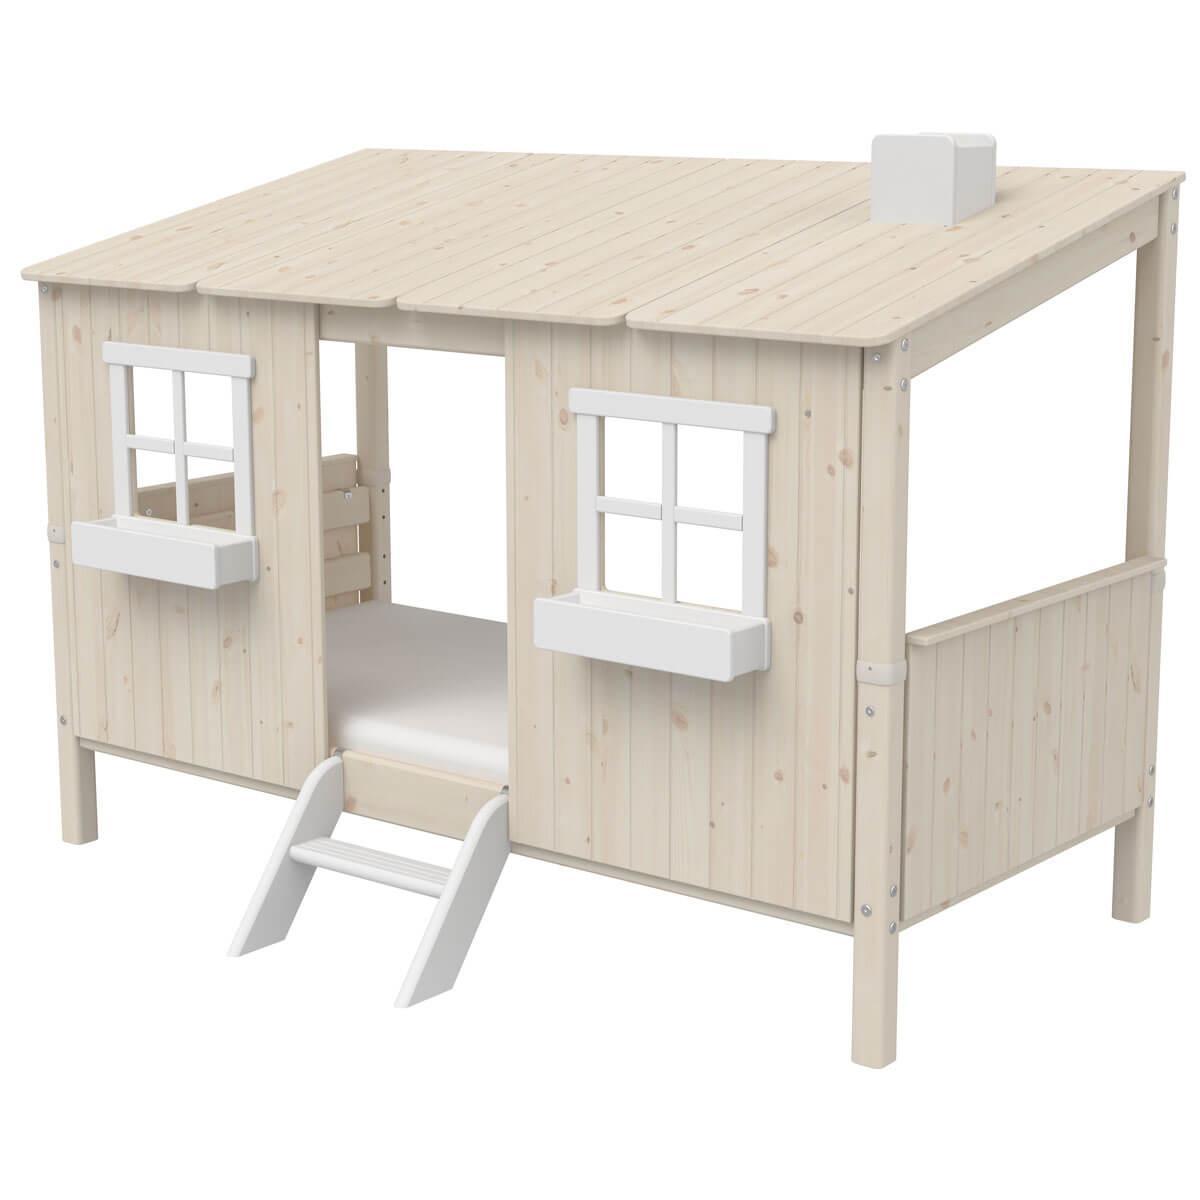 Lit bas évolutif cabane 90x200cm 1/1 PLAY HOUSE CLASSIC Flexa blanchi-blanc